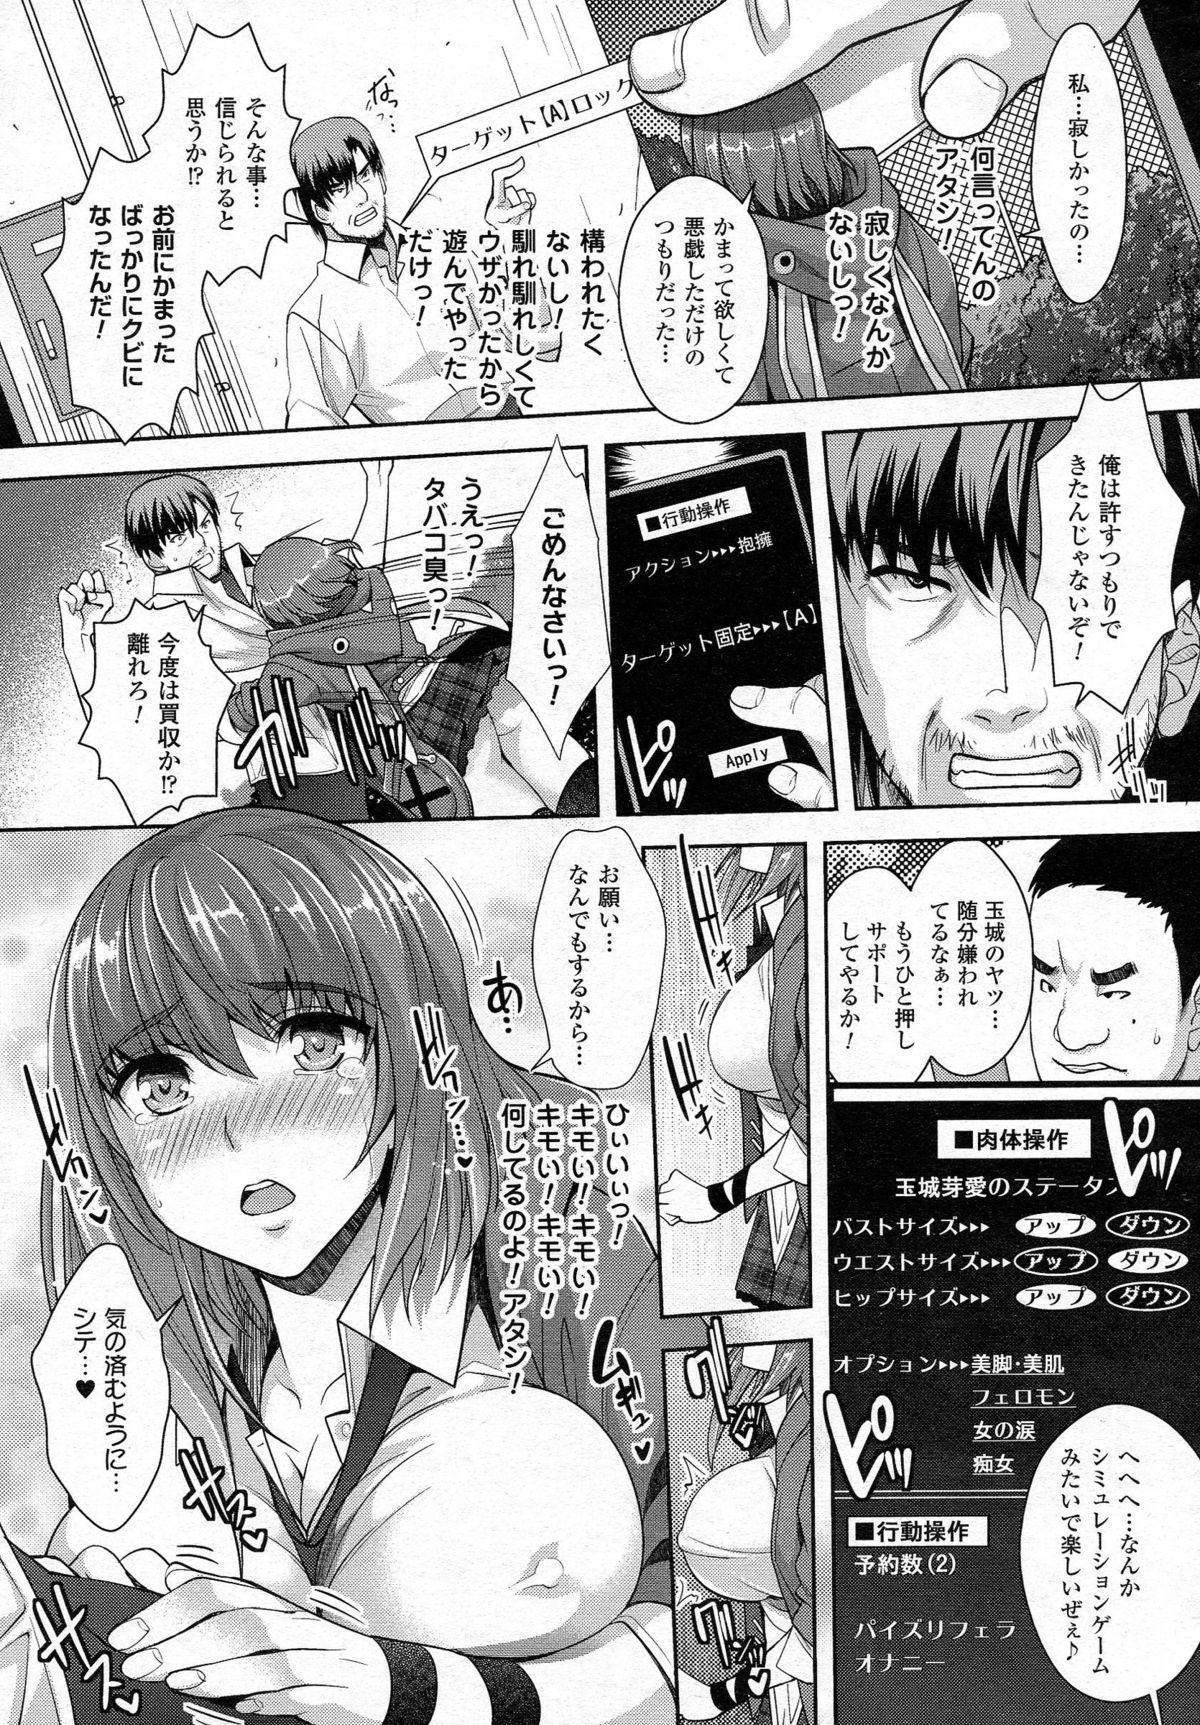 COMIC Unreal 2015-06 Vol. 55 + Hisasi Illust Shuu 255